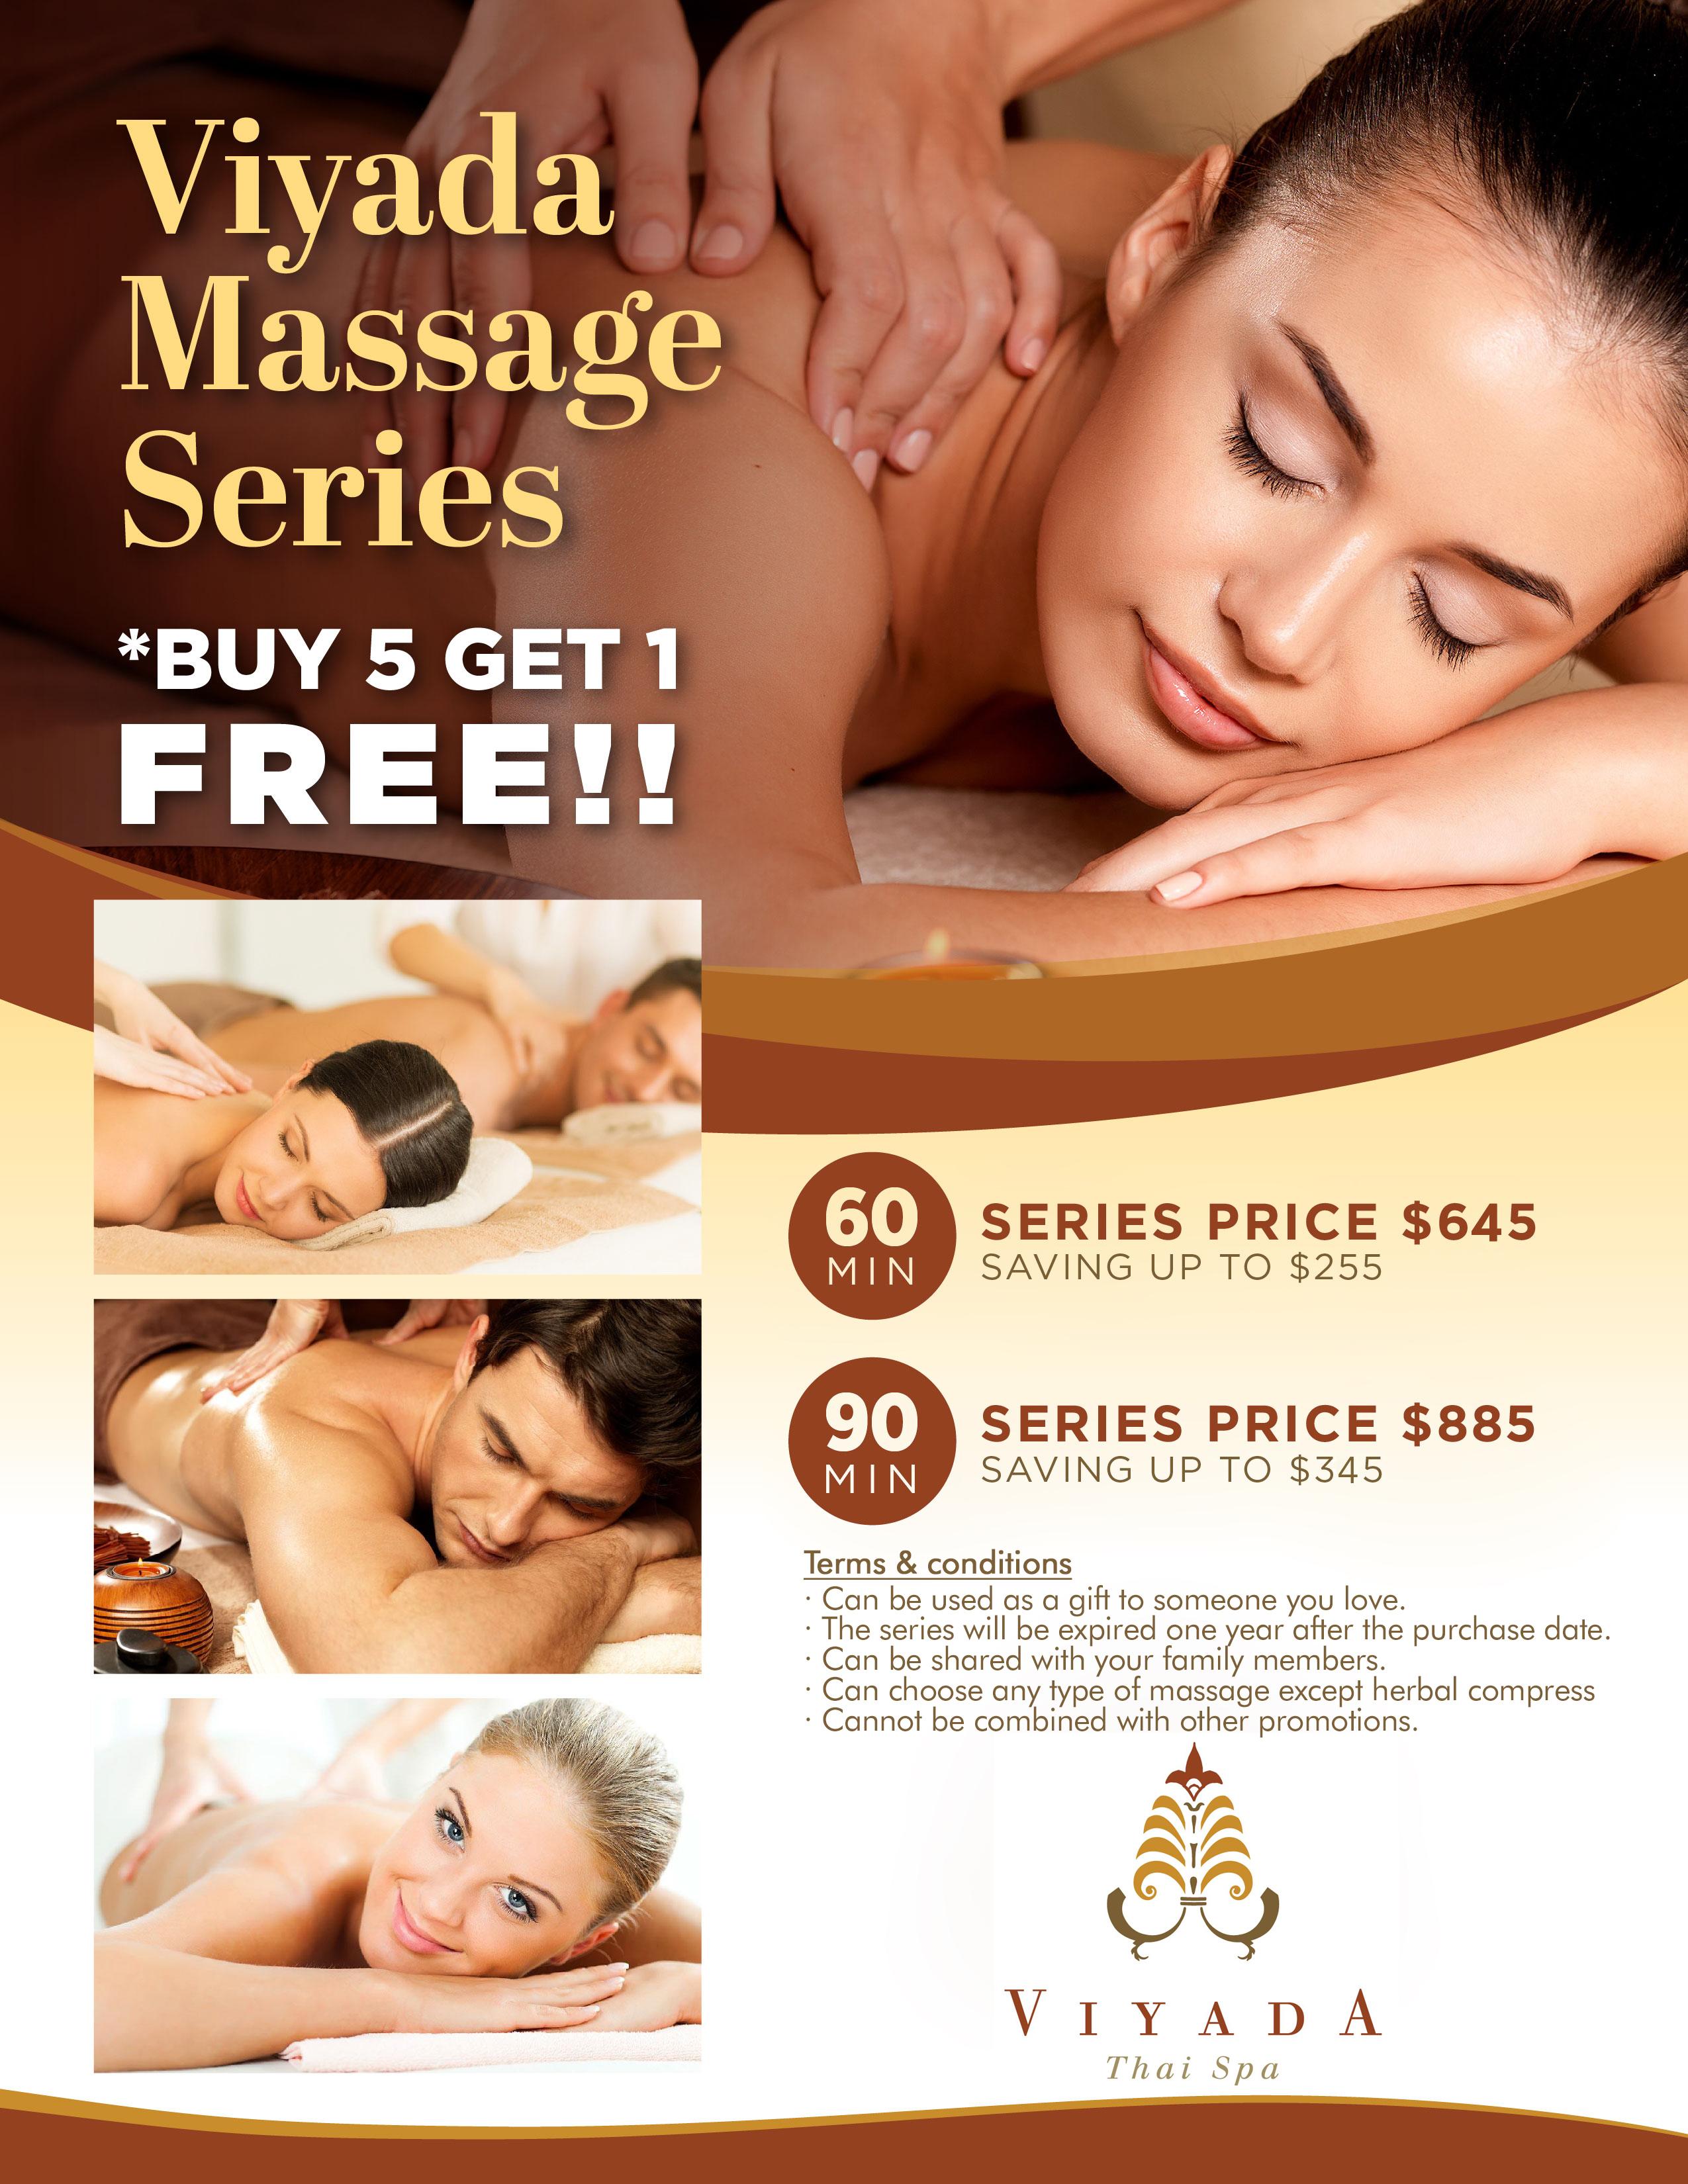 Viyada Massage Series